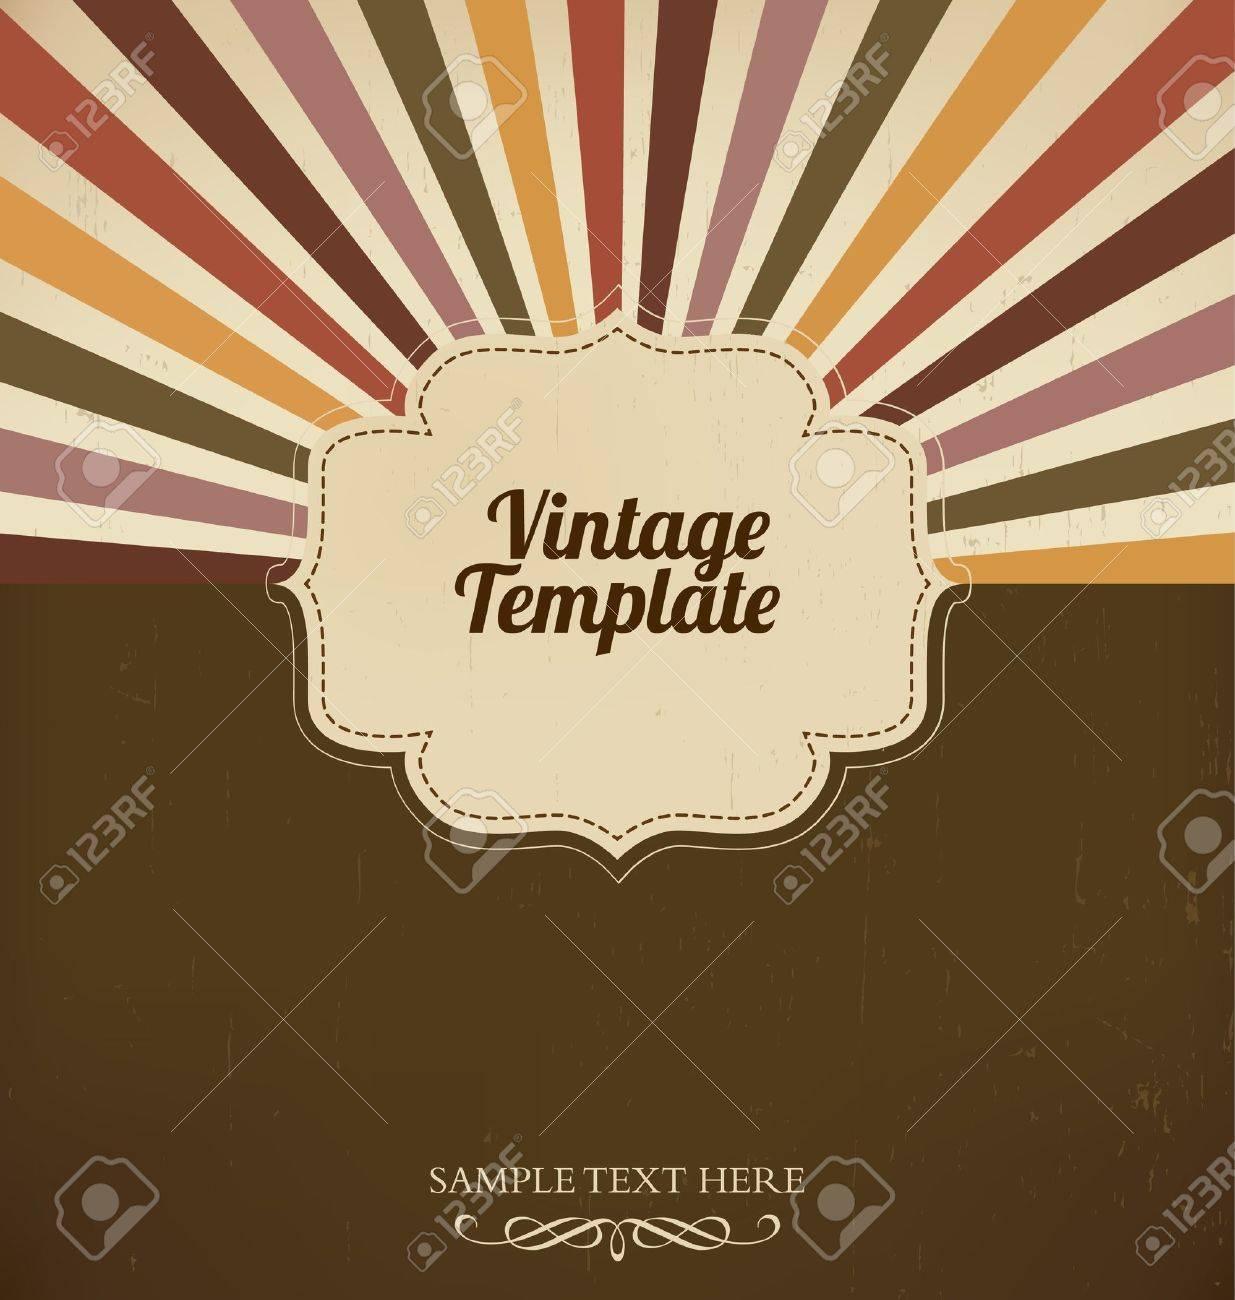 Vintage template with retro sun burst background Stock Vector - 14553626